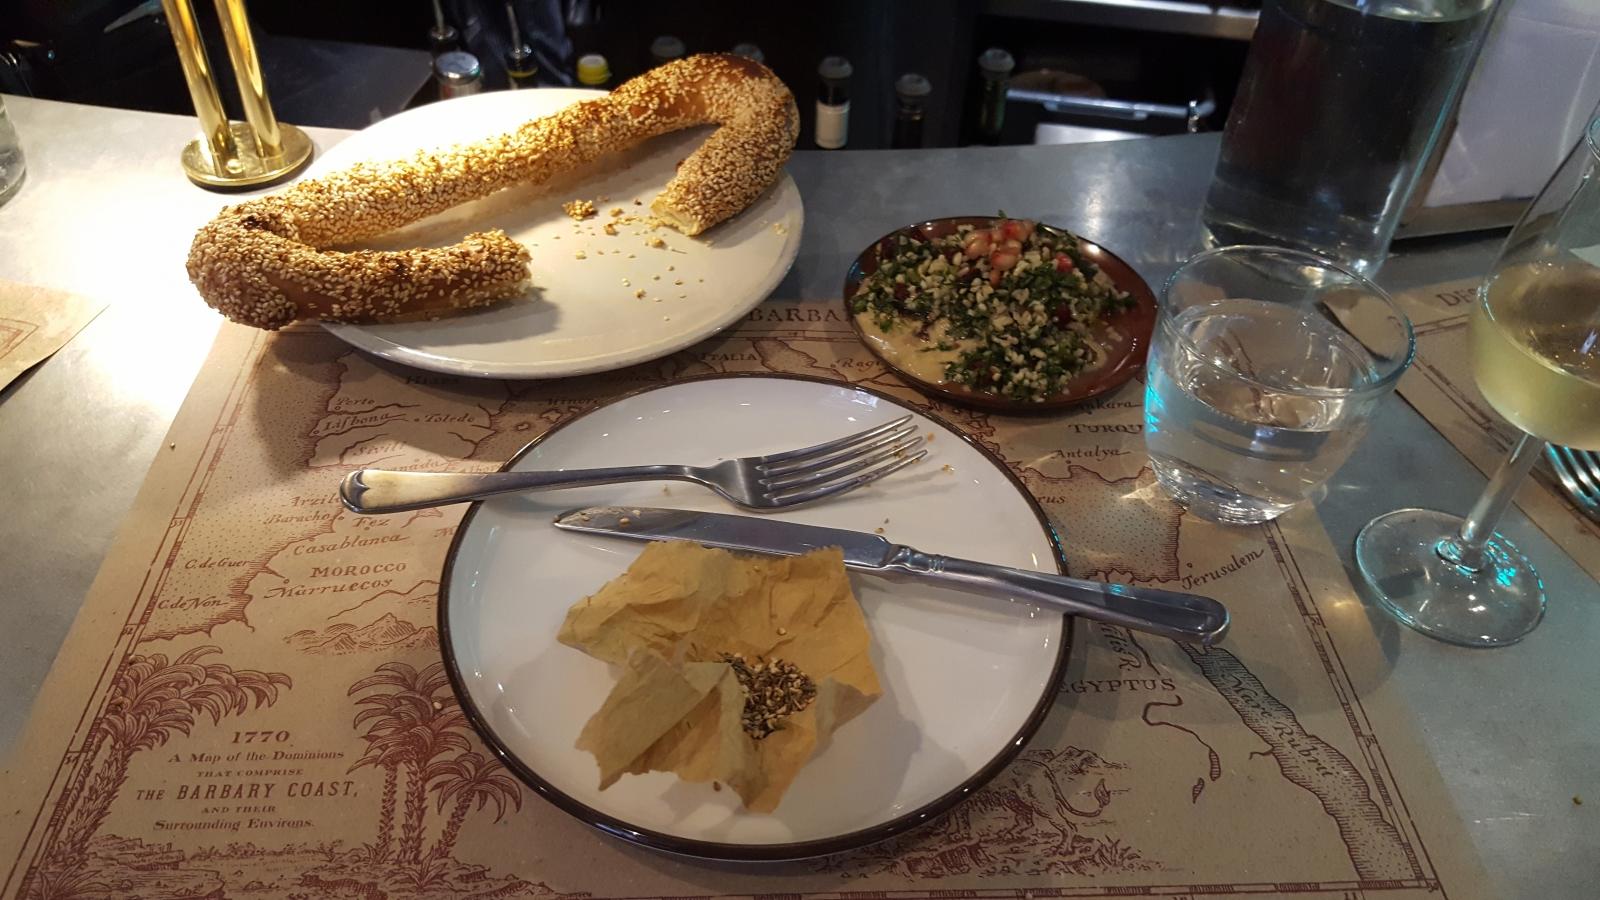 Jerusalem bagel, za'atar, tabouleh at the Barbary